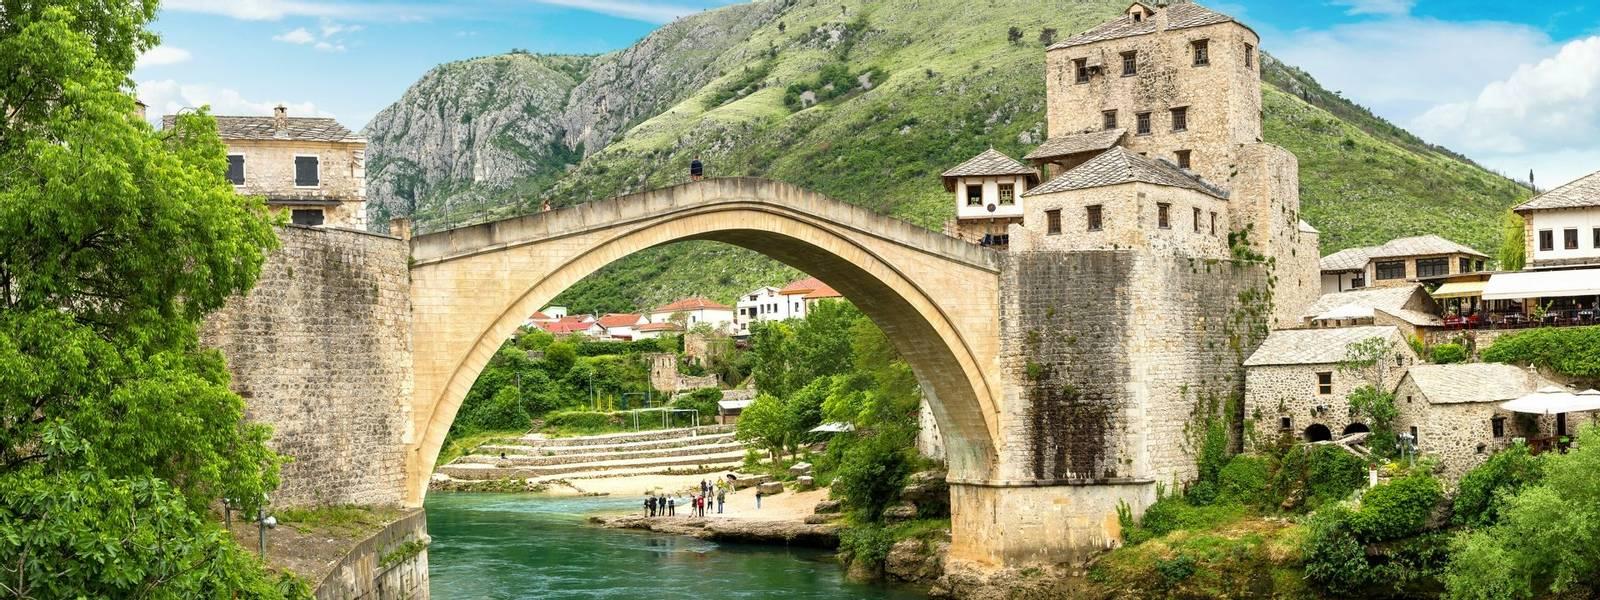 The Old Bridge in Mostar